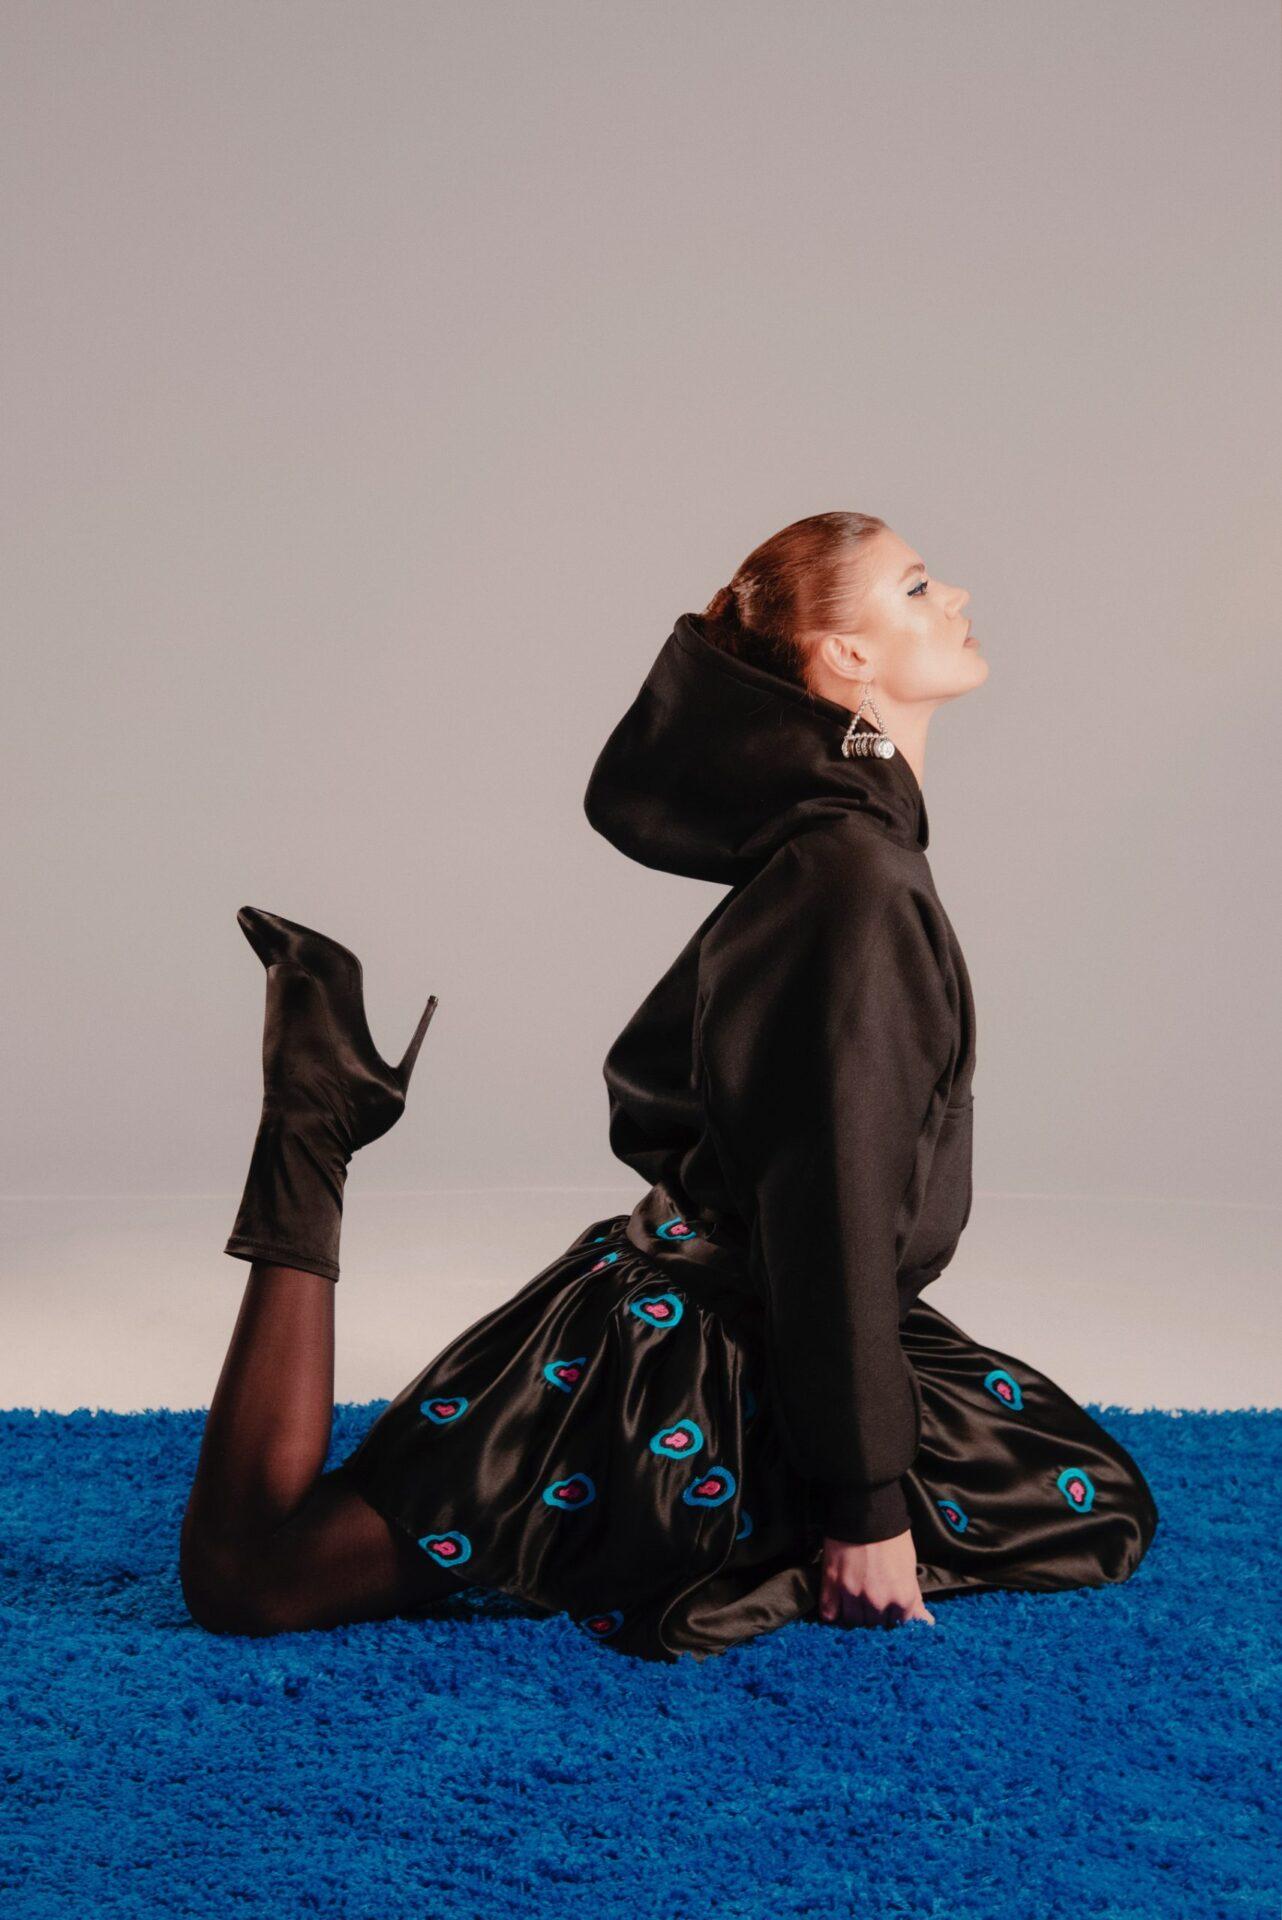 NADA DEHNI is a Lebanese Ready-To-Wear fashion brand based in Berlin